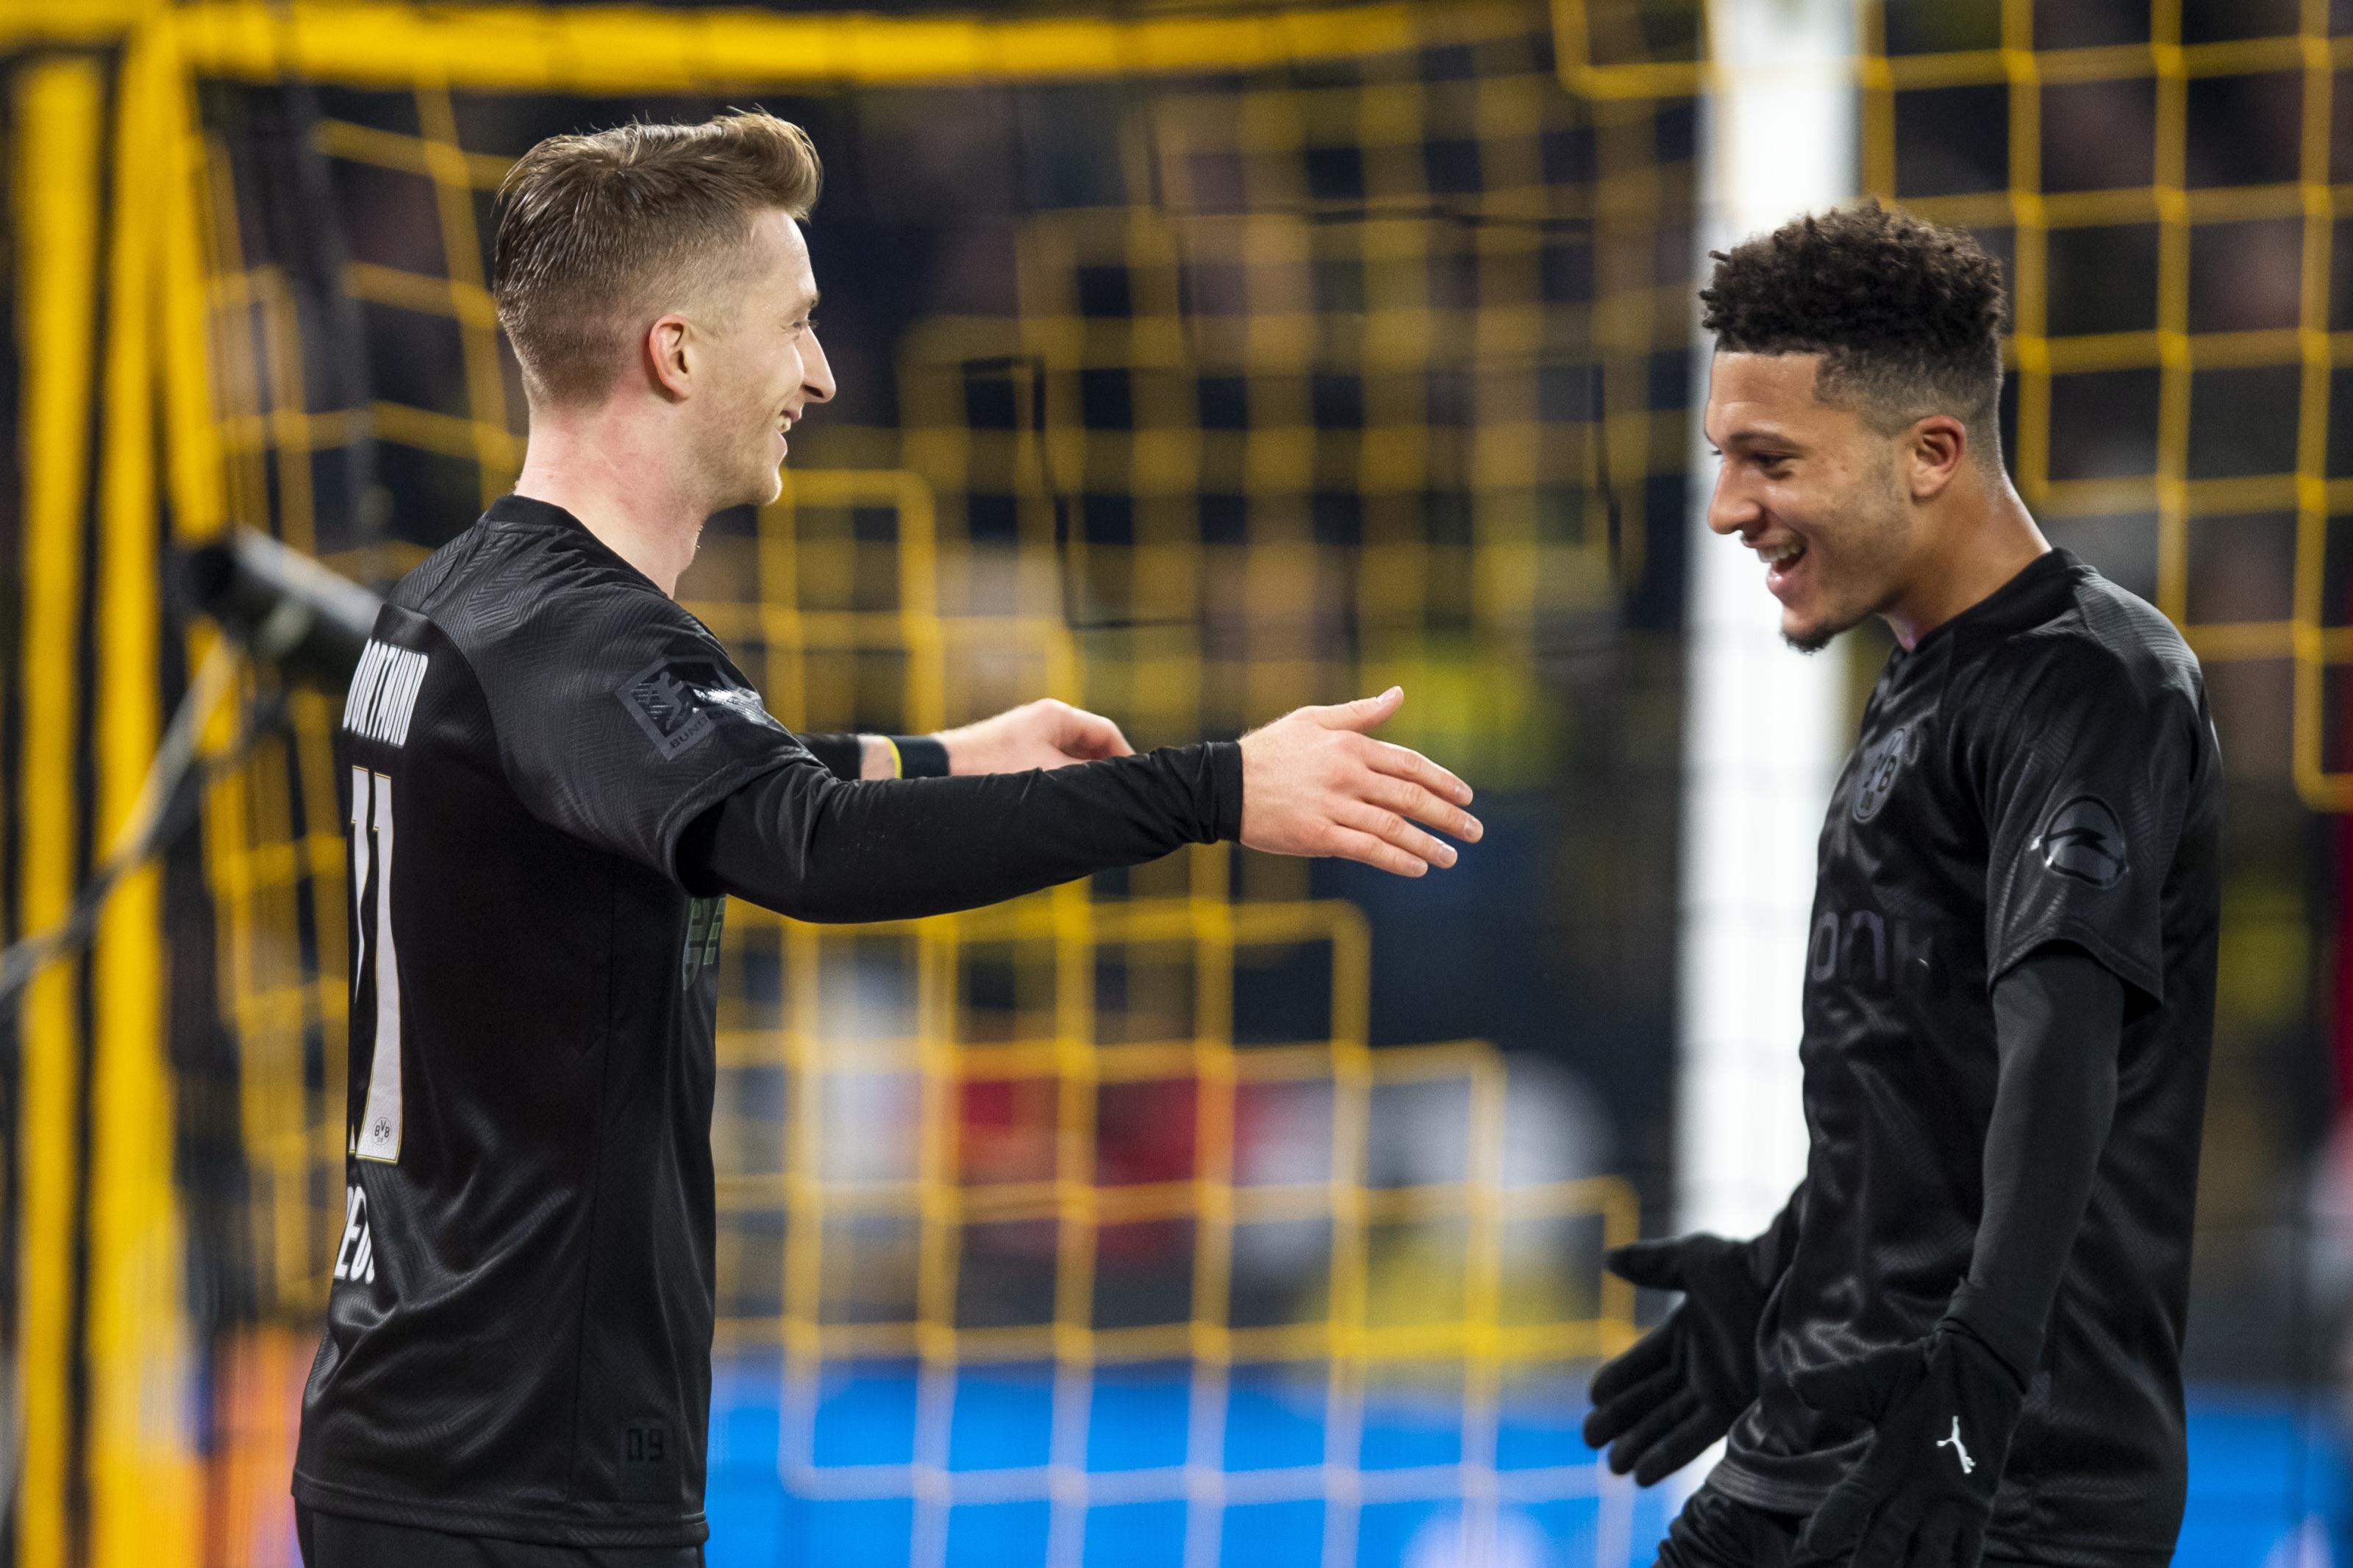 Marco Reus Advises Jadon Sancho To Stay At Borussia Dortmund